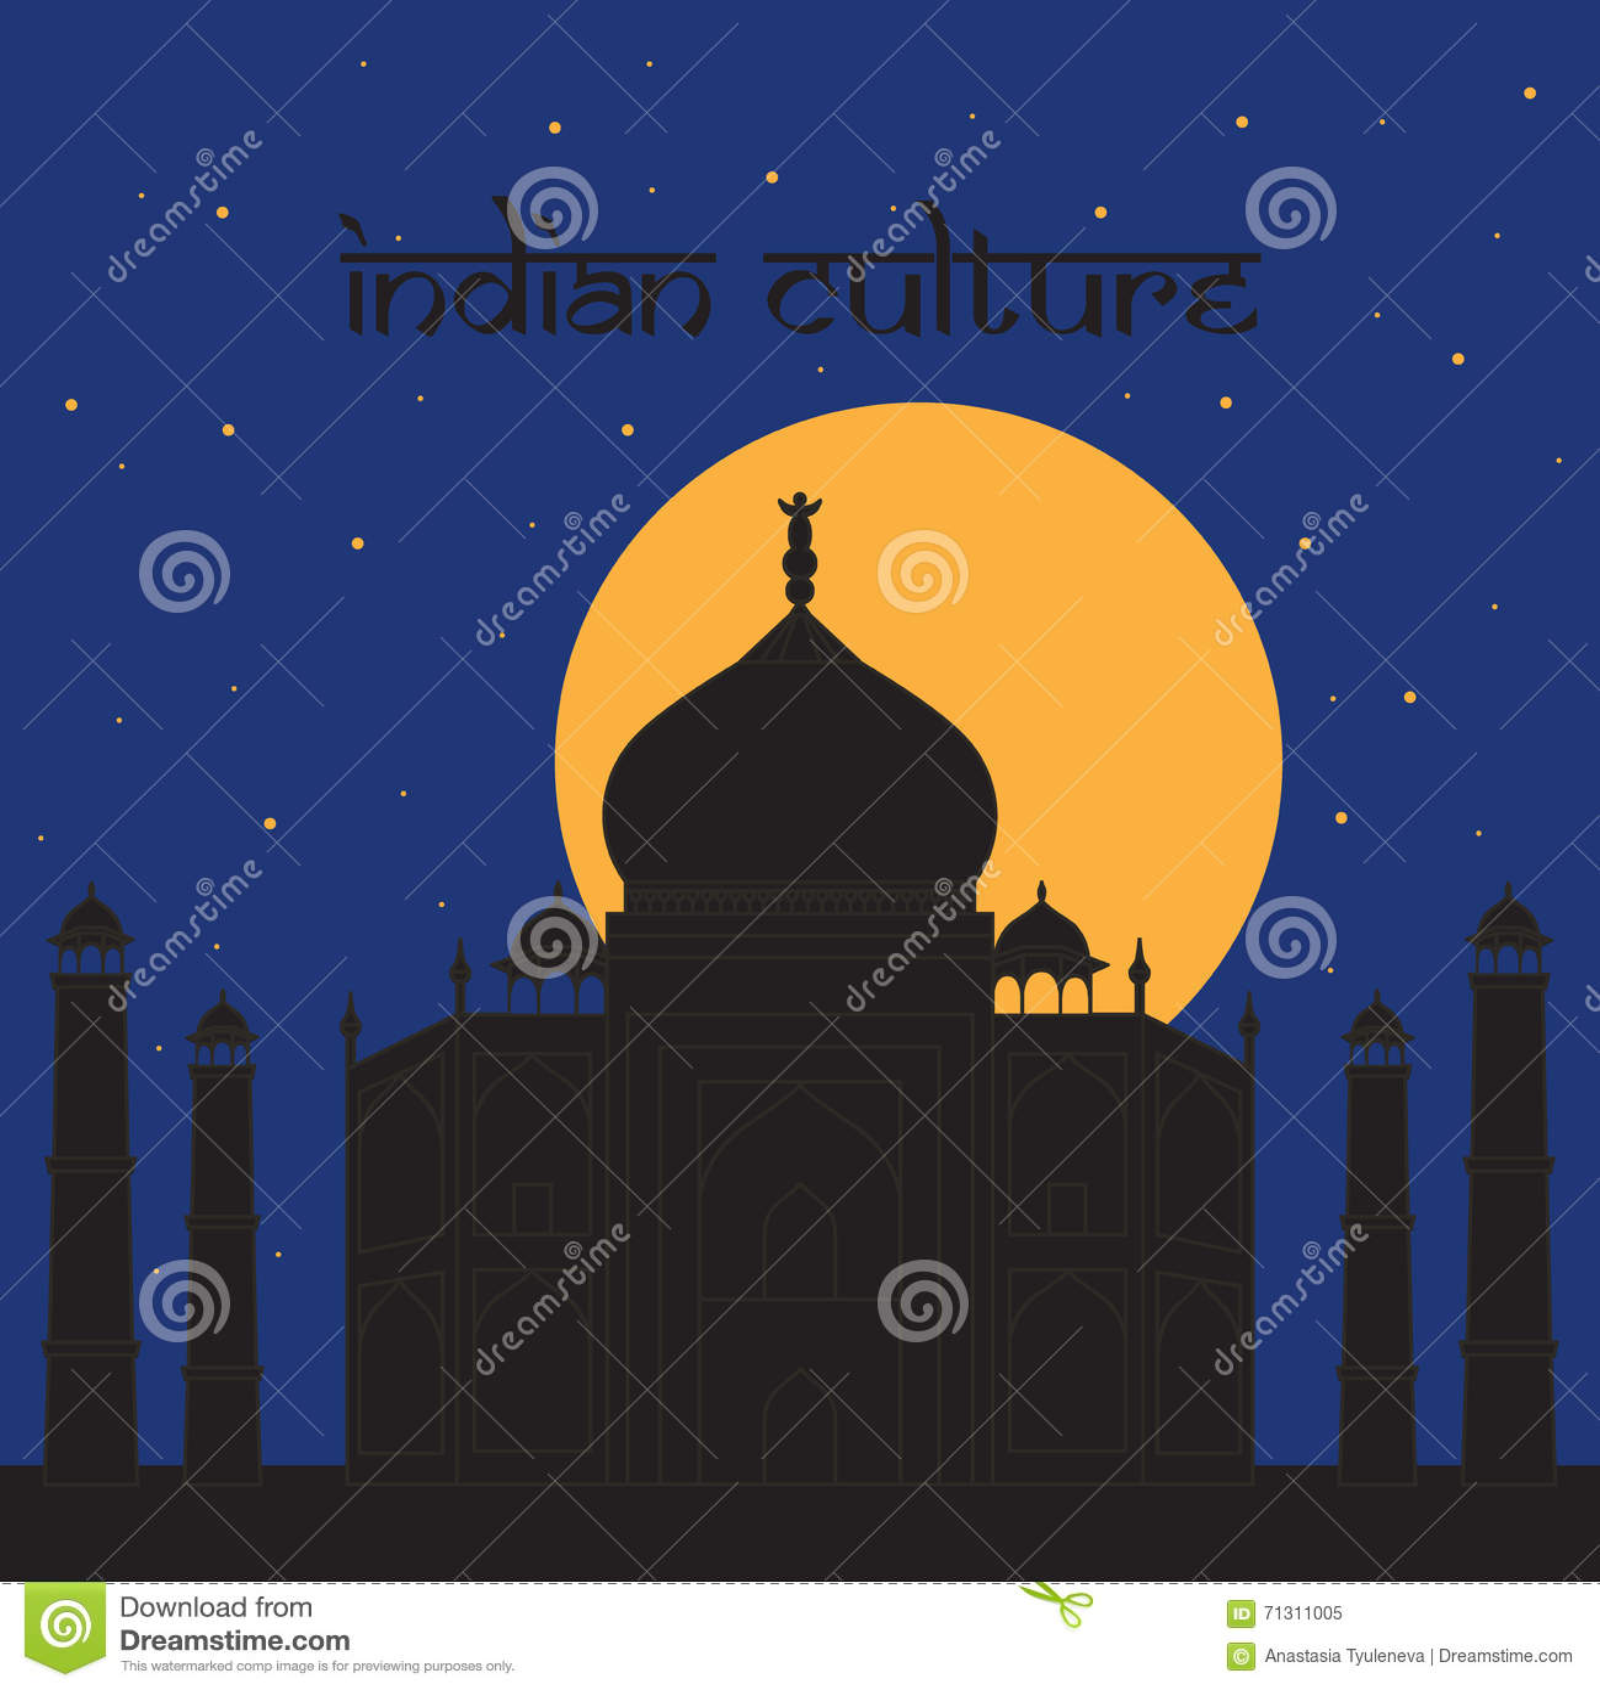 Taj Mahal Temple Landmark in Agra, India Indisch wit marmeren mausoleum, Indische architectuurnacht